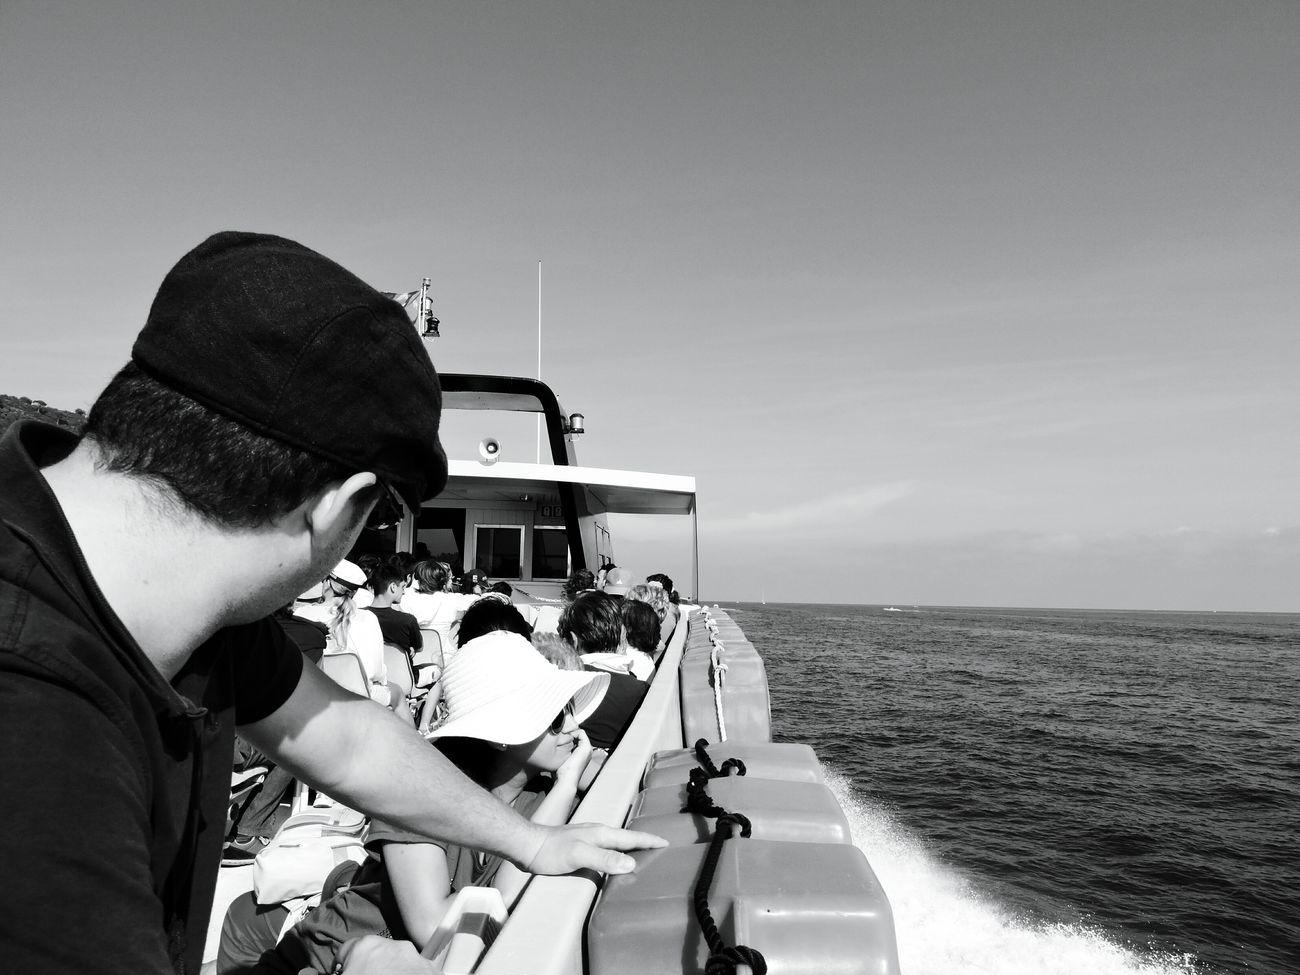 The Adventure Handbook Travelling Liguria Nikon Blackandwhite Enjoying Life Italy Relaxing Waiting Ferryboat